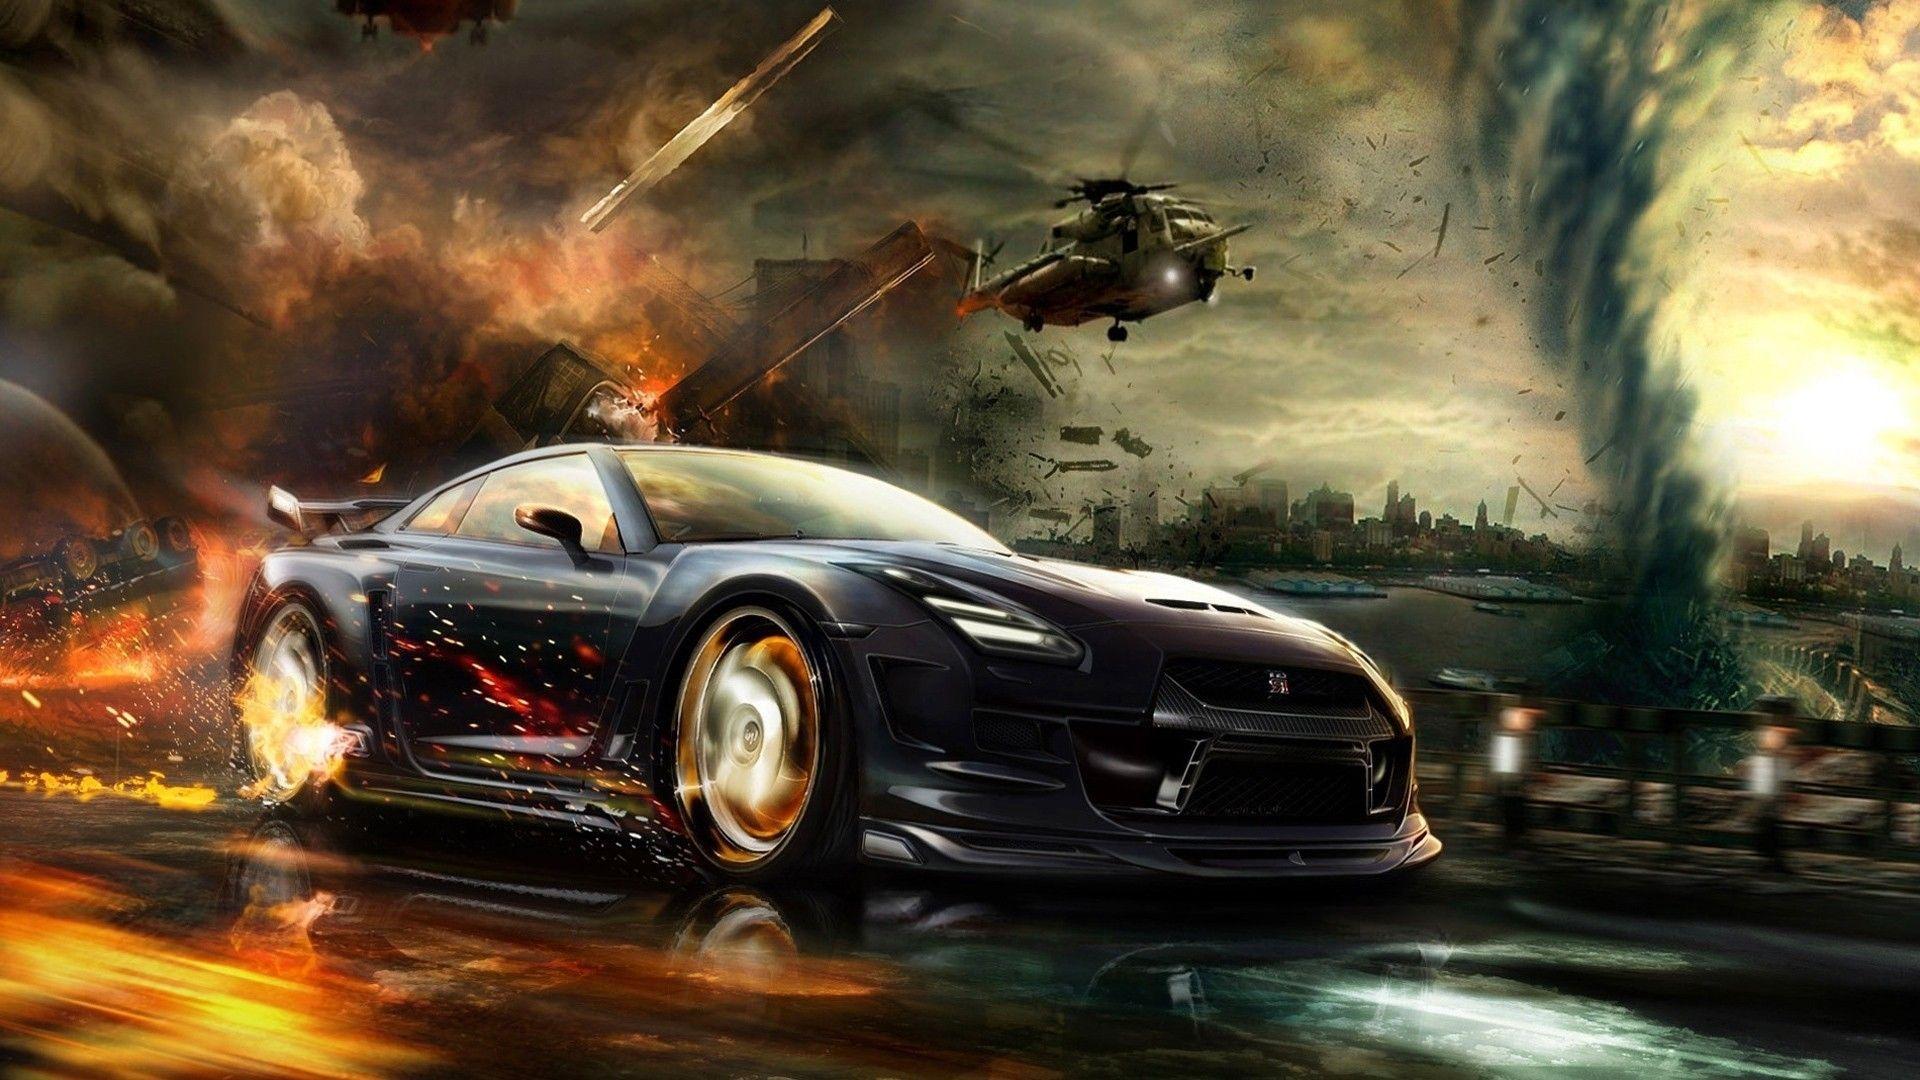 Cgi Vehicle Nissan Gt R Digital Art Car Fire Render Helicopters Explosion Wallpape Car Wallpapers Cool Car Wallpapers Hd Cool Car Backgrounds